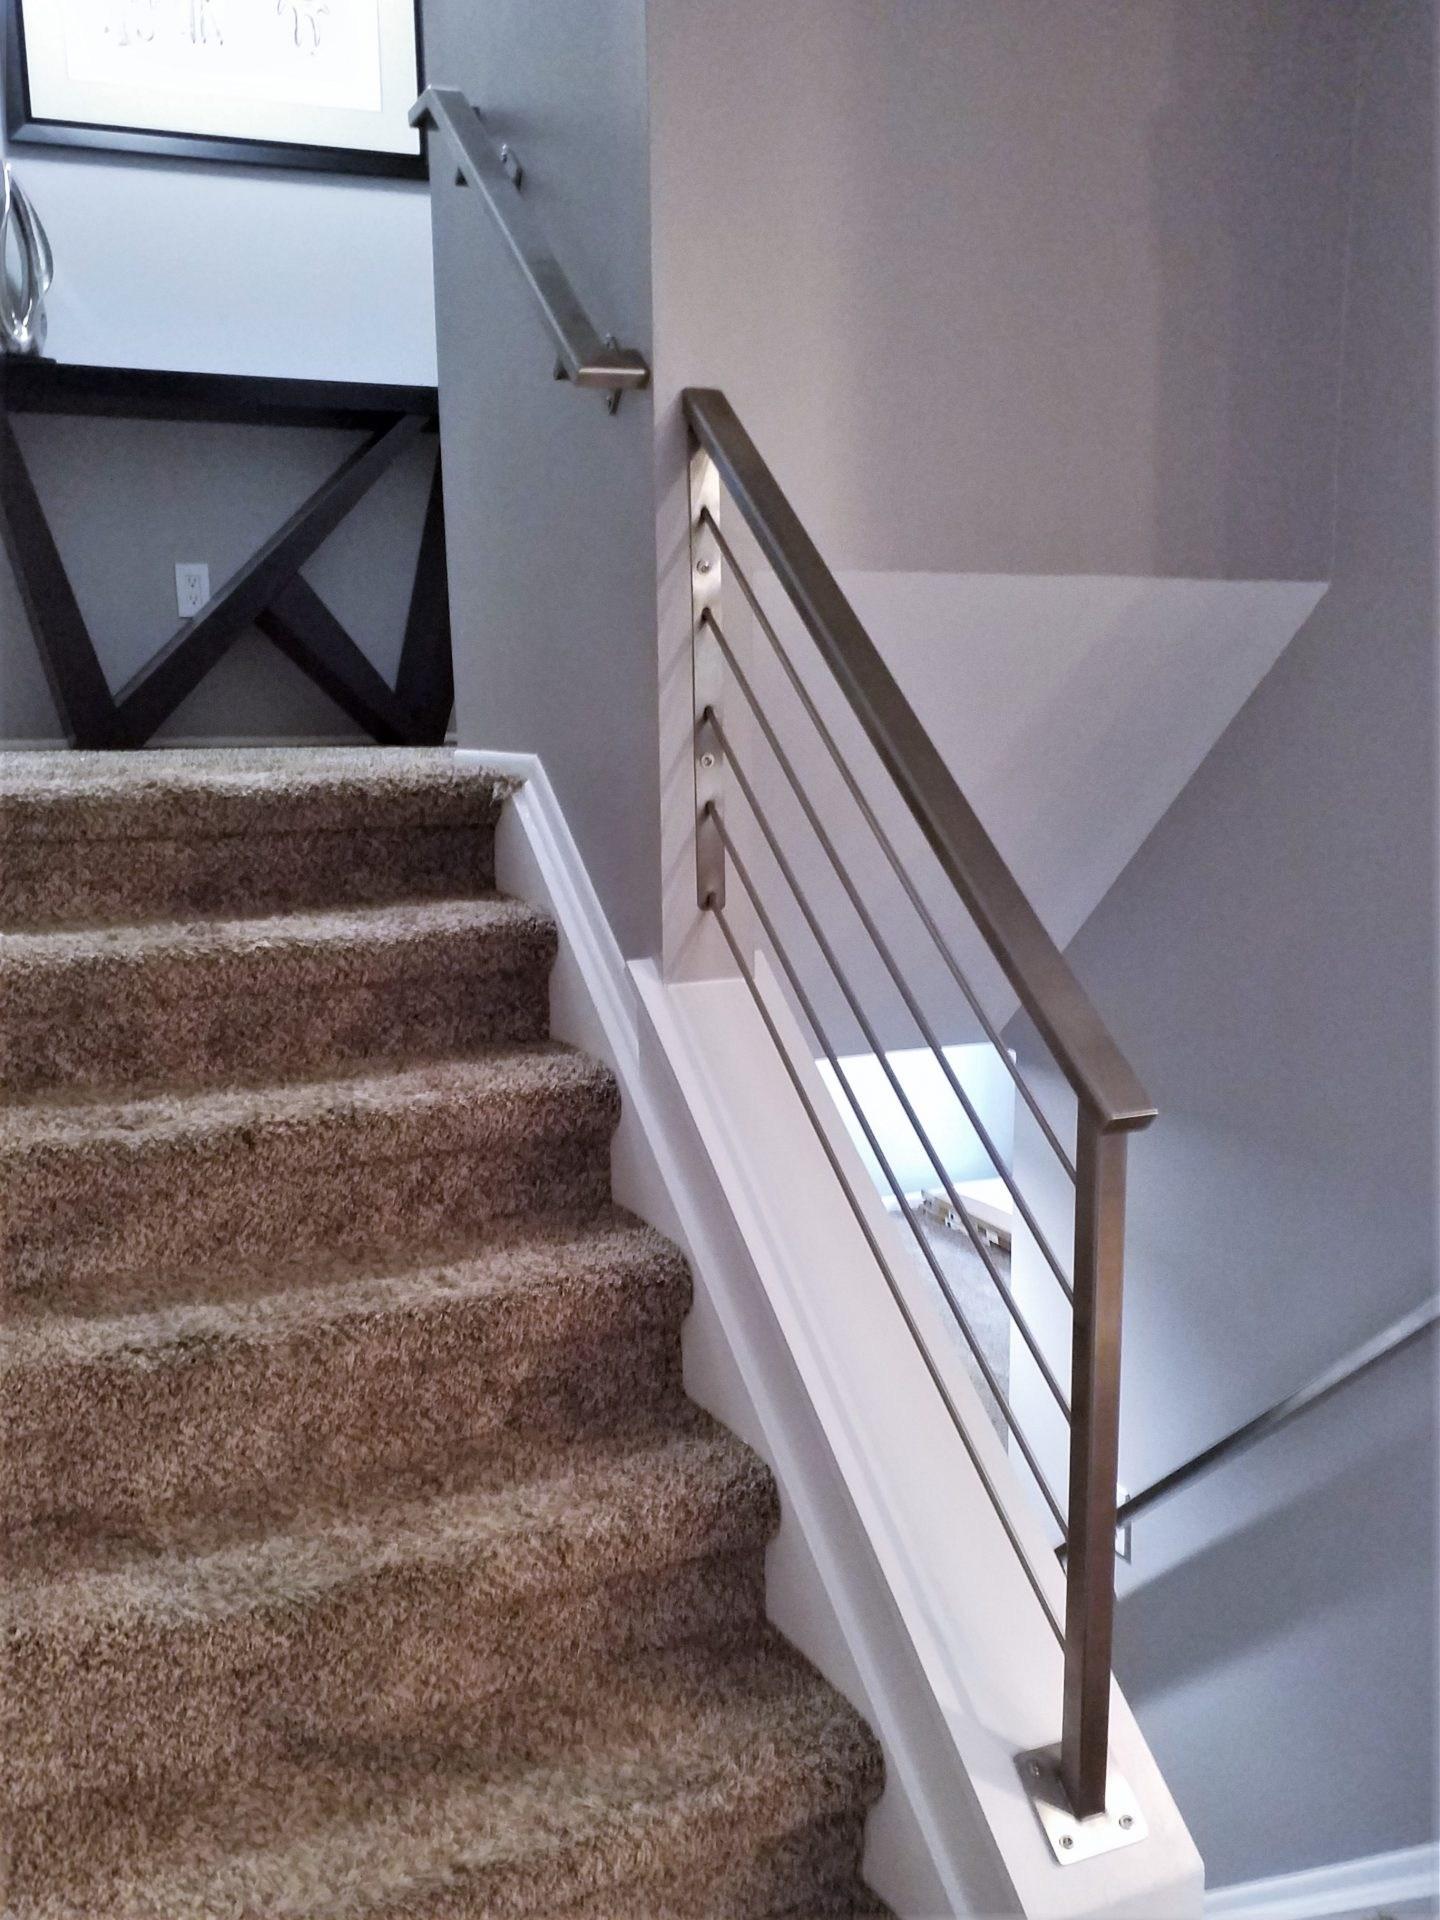 Stainless Steel Handrail Stair Railing Great Lakes Metal Fabrication | Steel Handrails For Steps | Baluster | Aluminum | Steel Tube | Price | Designing